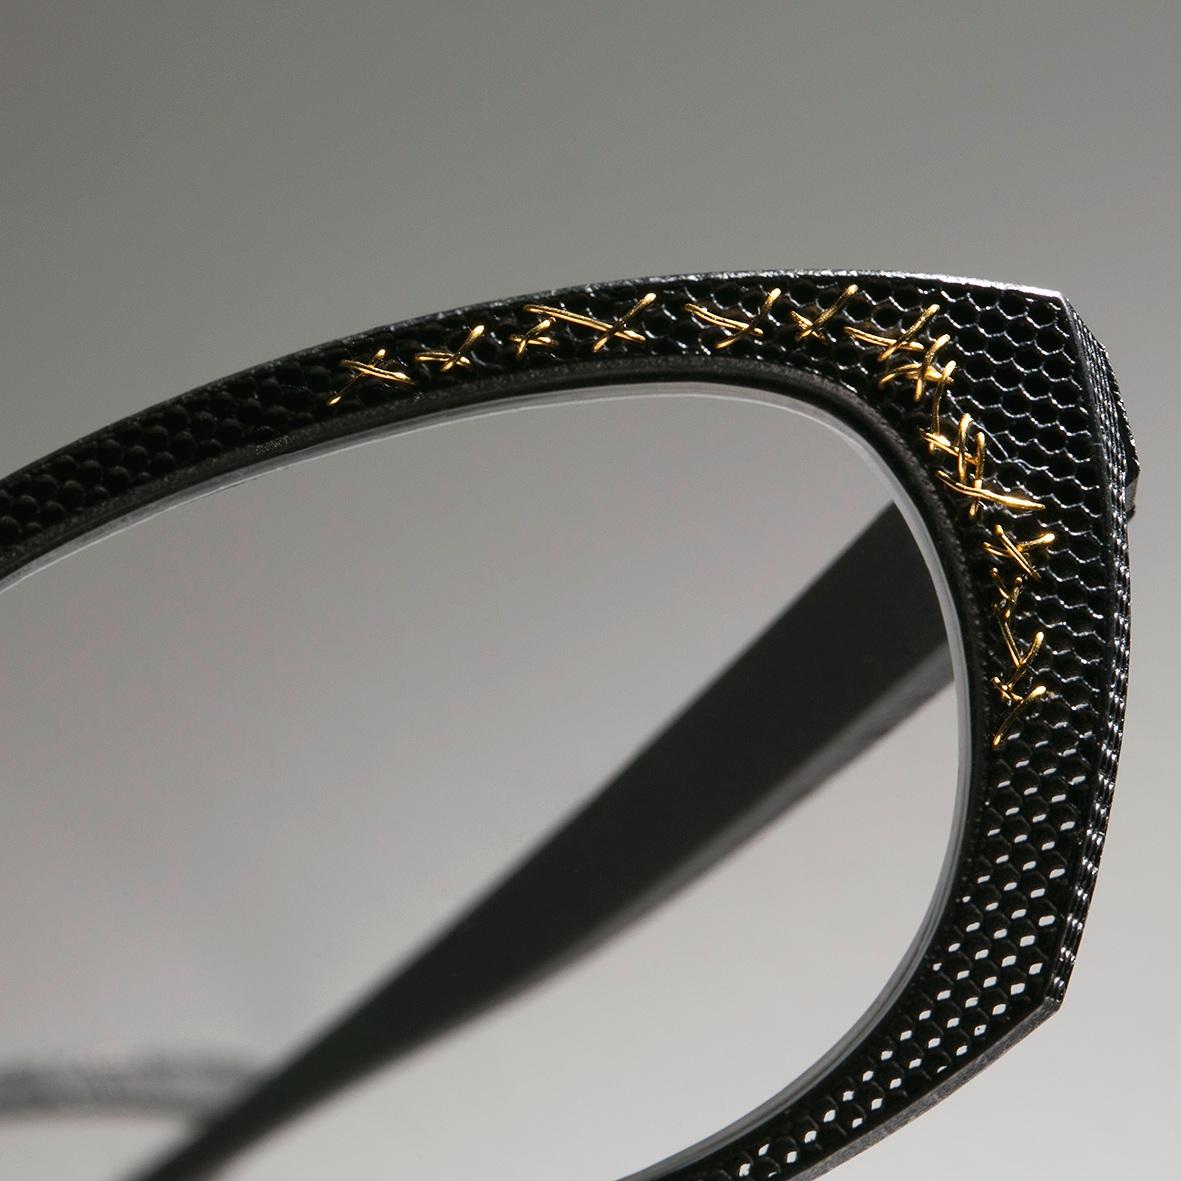 F1² with gold thread.jpg